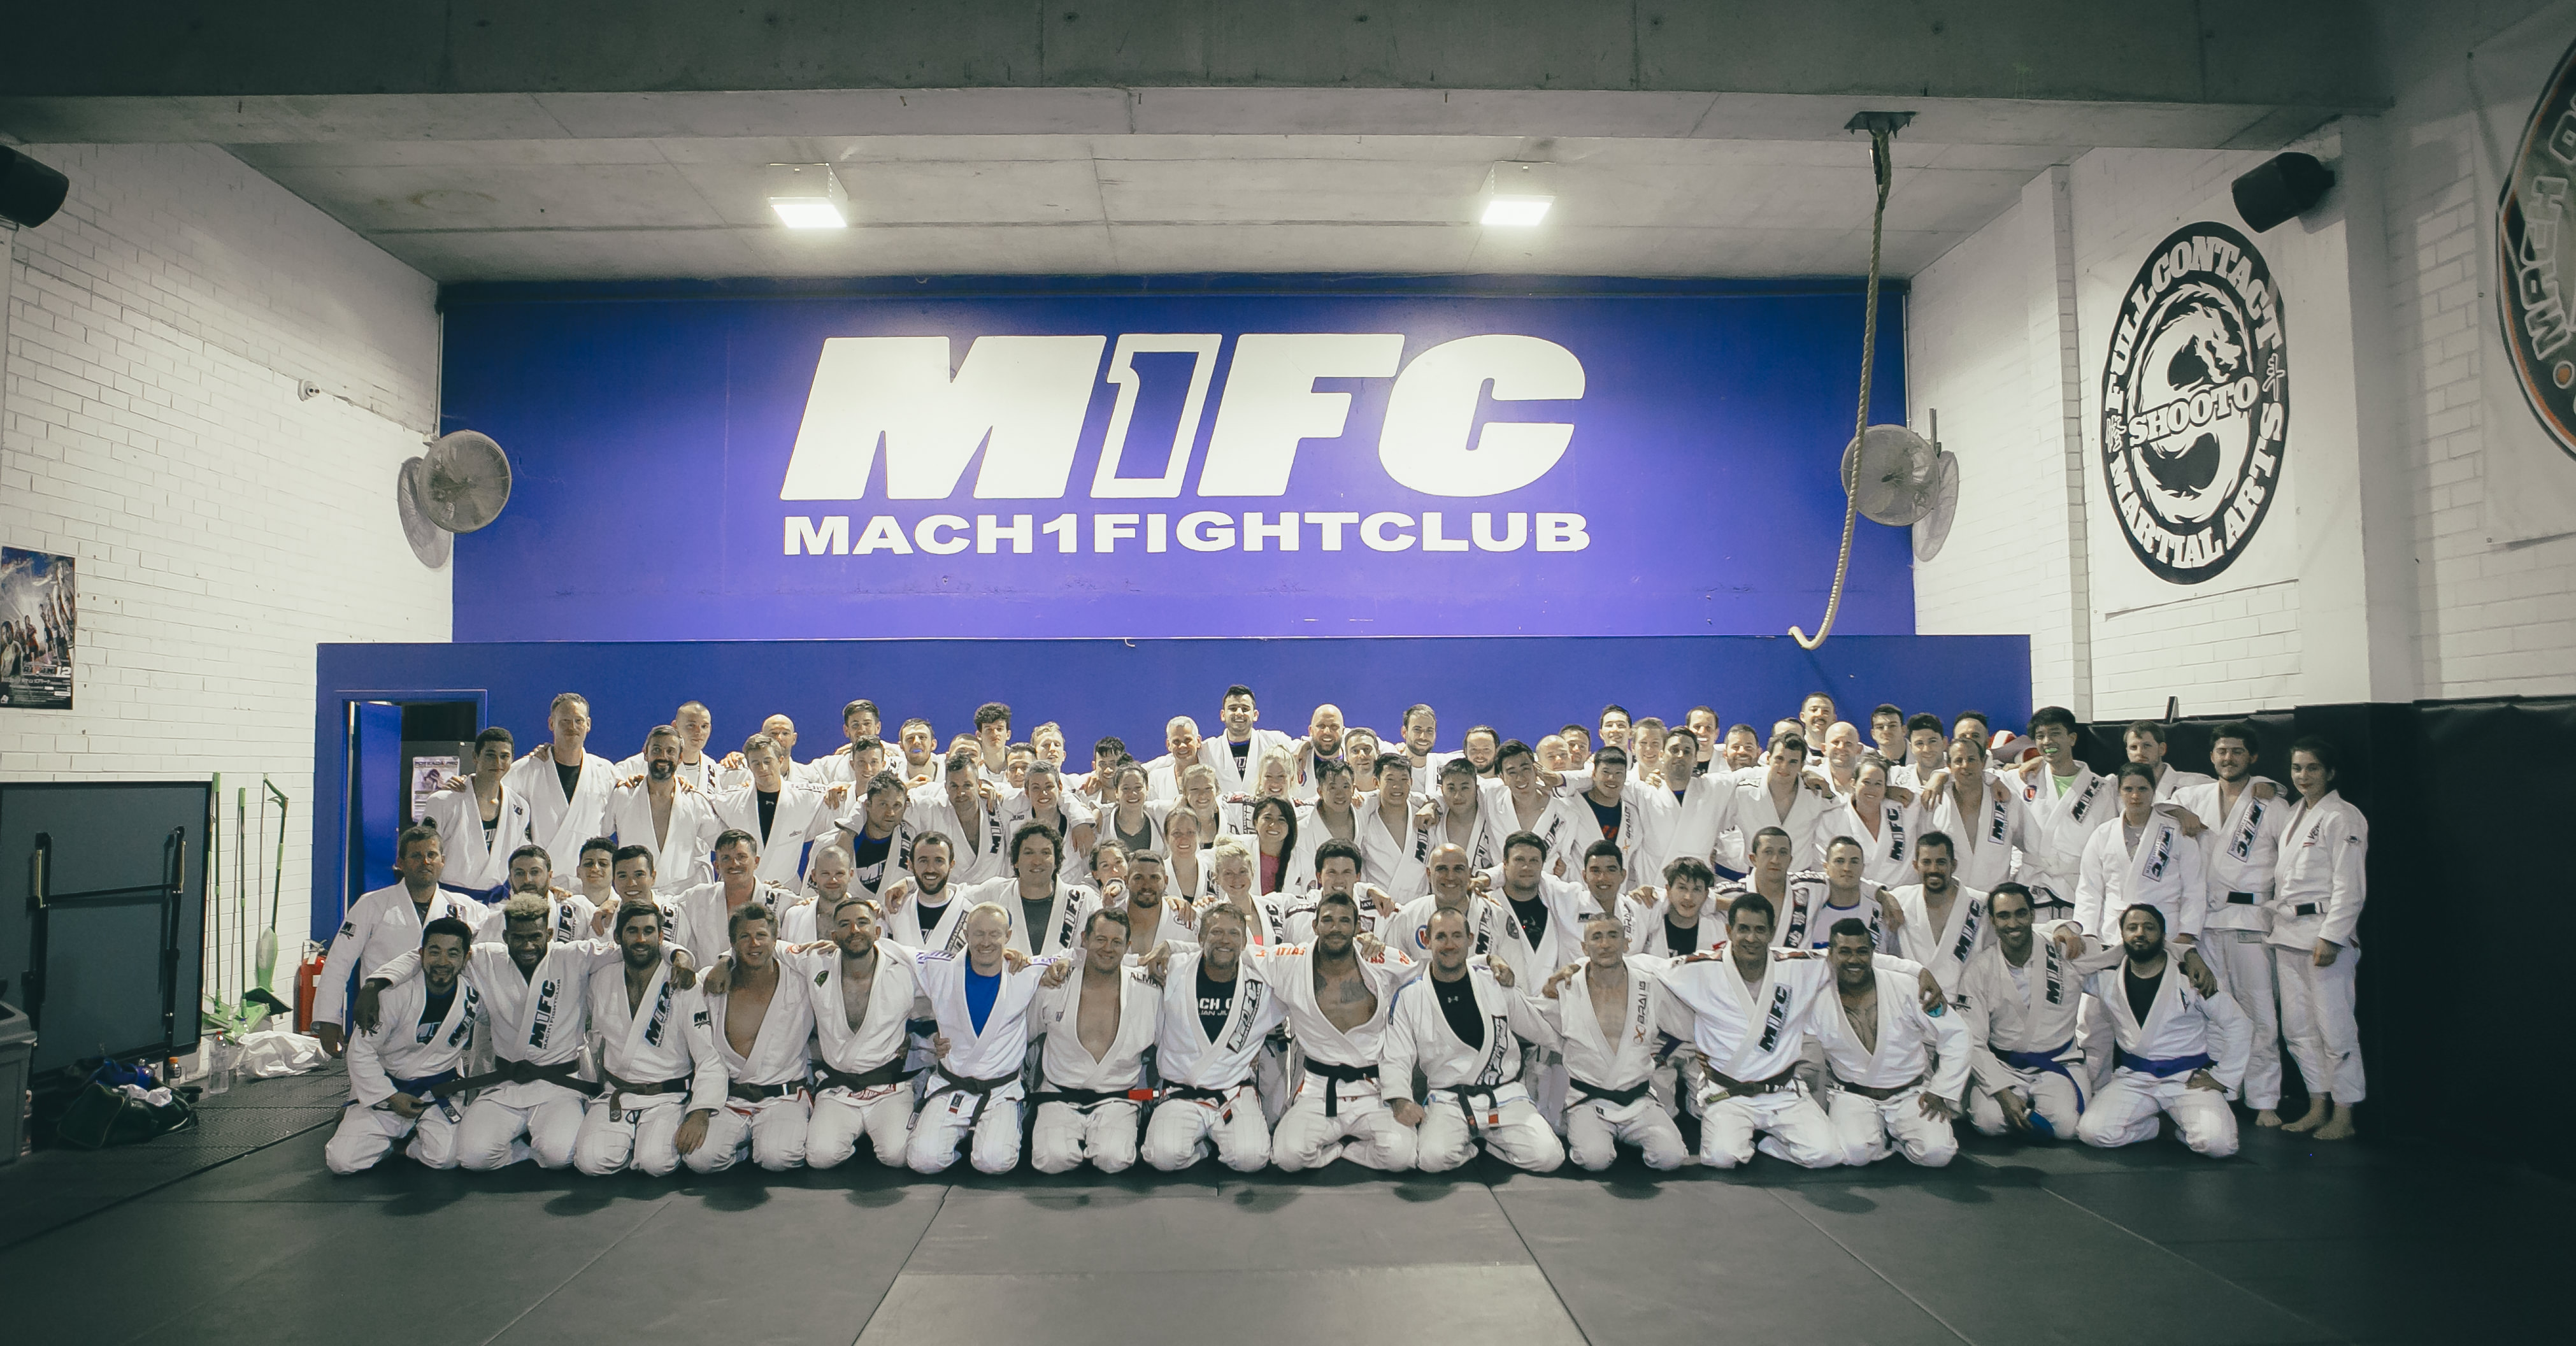 Jiu Jitsu Grading Night at M1FC